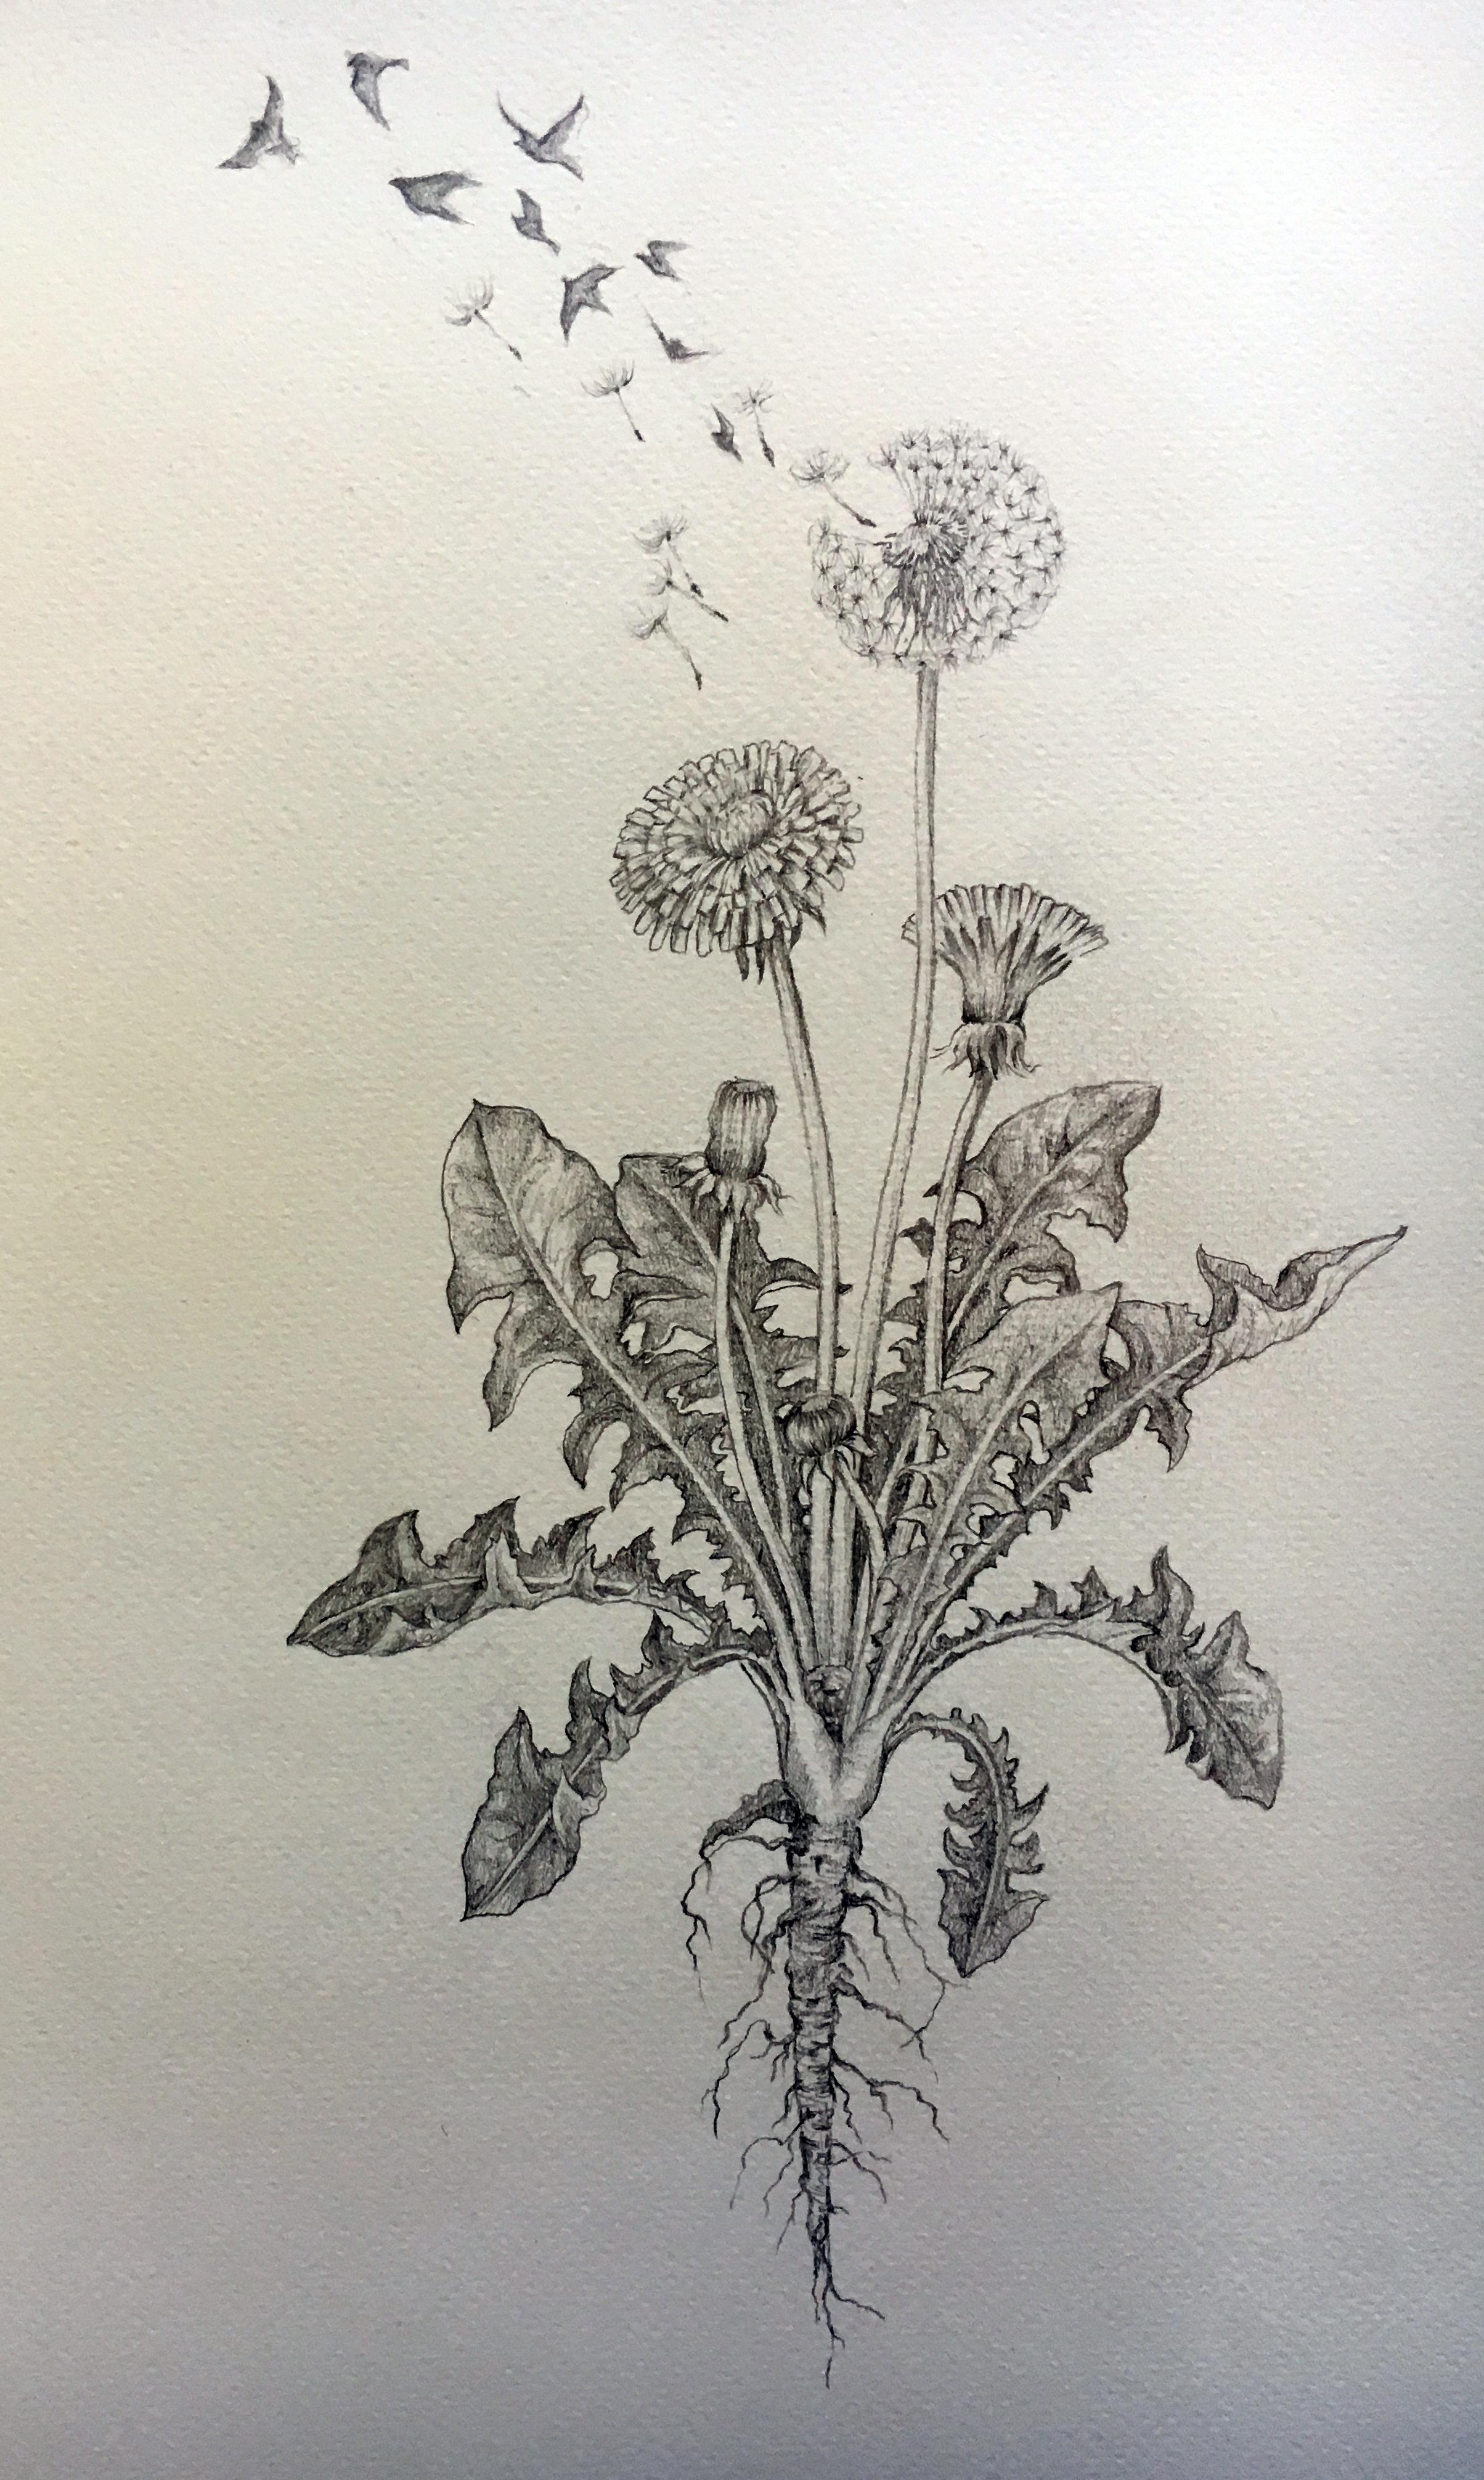 Tattoo Commission  Graphite pencil on watercolor paper